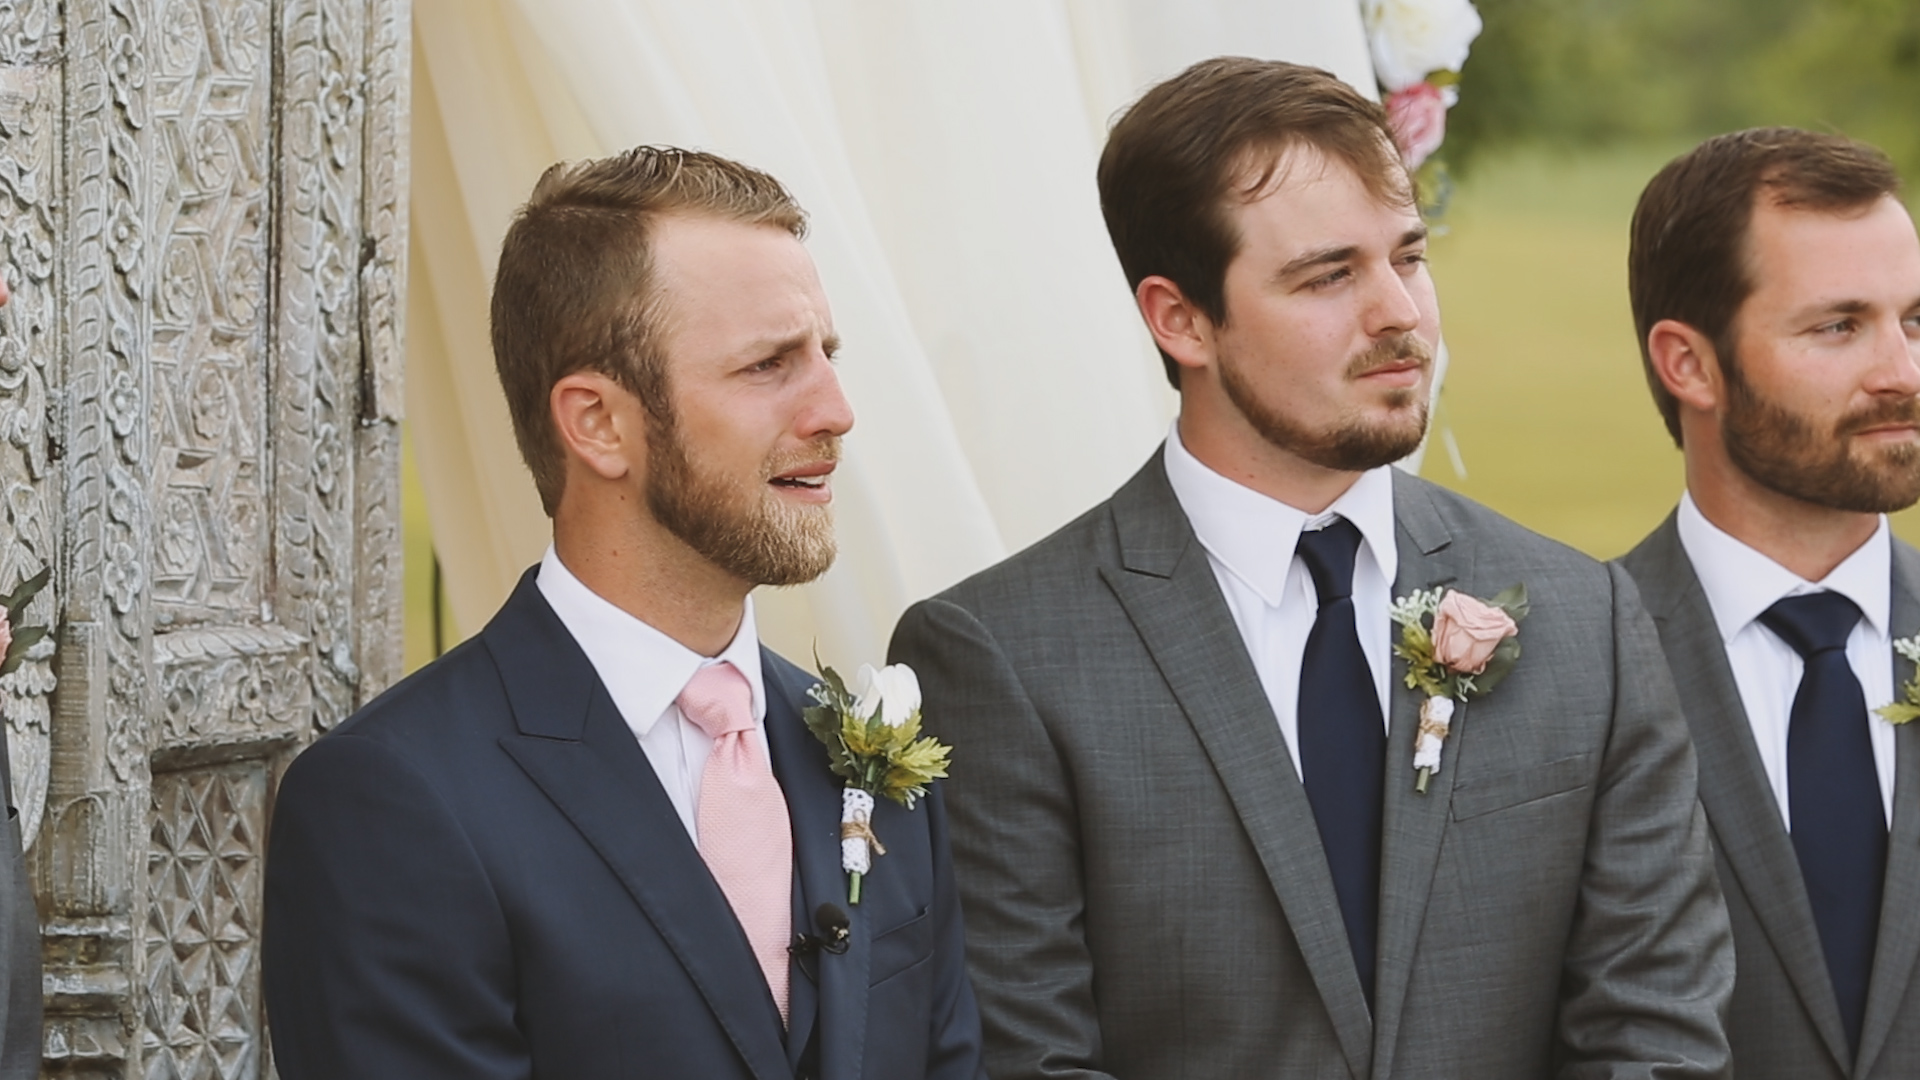 Amanda and Hayden_The White Magnolia Farm Weddings_New Orleans videographer_Wedding groom reaction